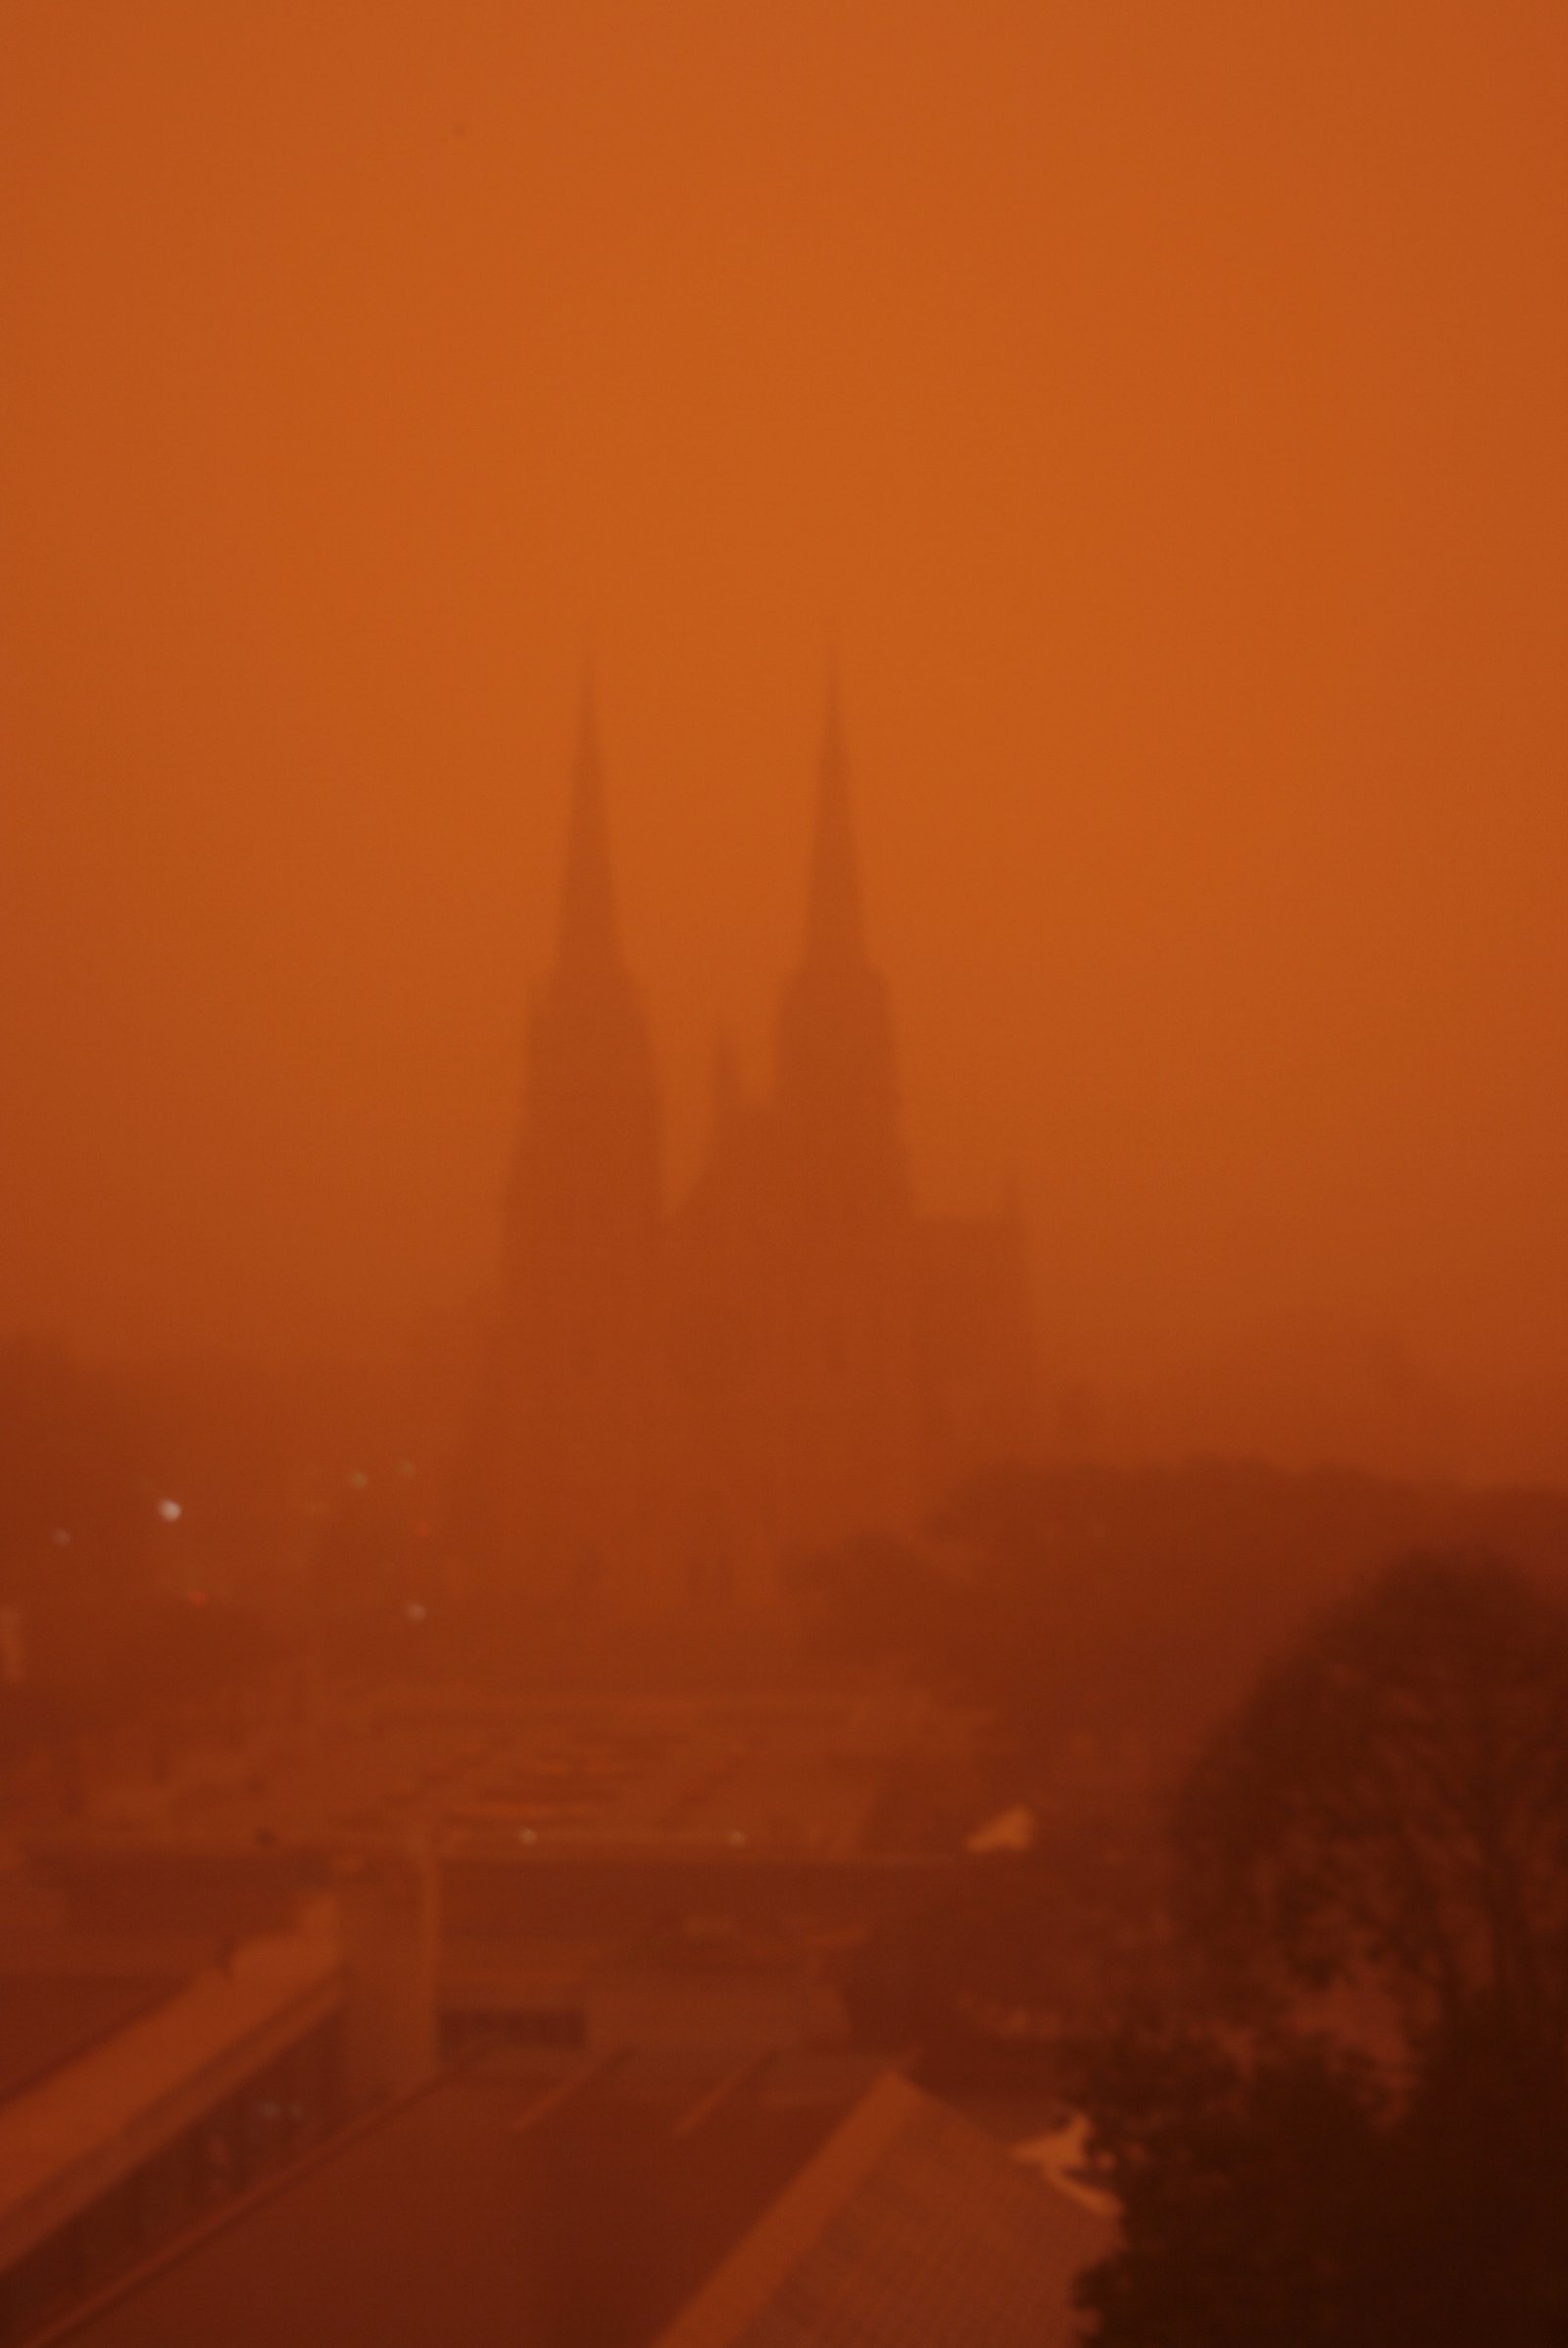 Dust storm Sydney 23 September 2009